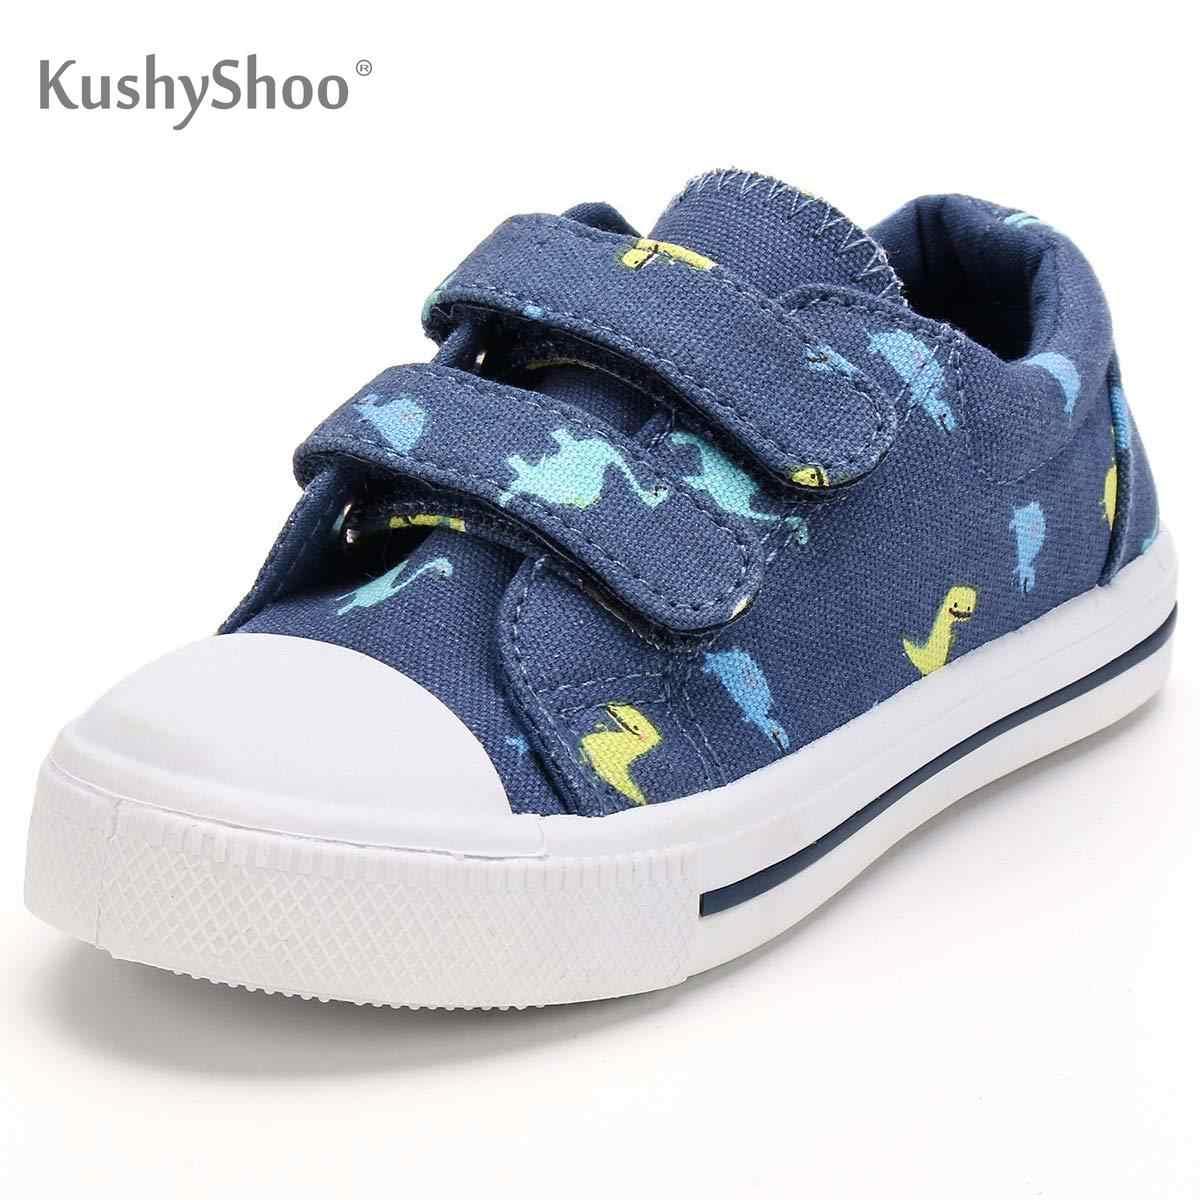 KushyShoo เด็กรองเท้าผ้าใบการ์ตูน Dual Hook และห่วงชายรองเท้าผ้าใบรองเท้าผ้าใบรองเท้าเด็ก